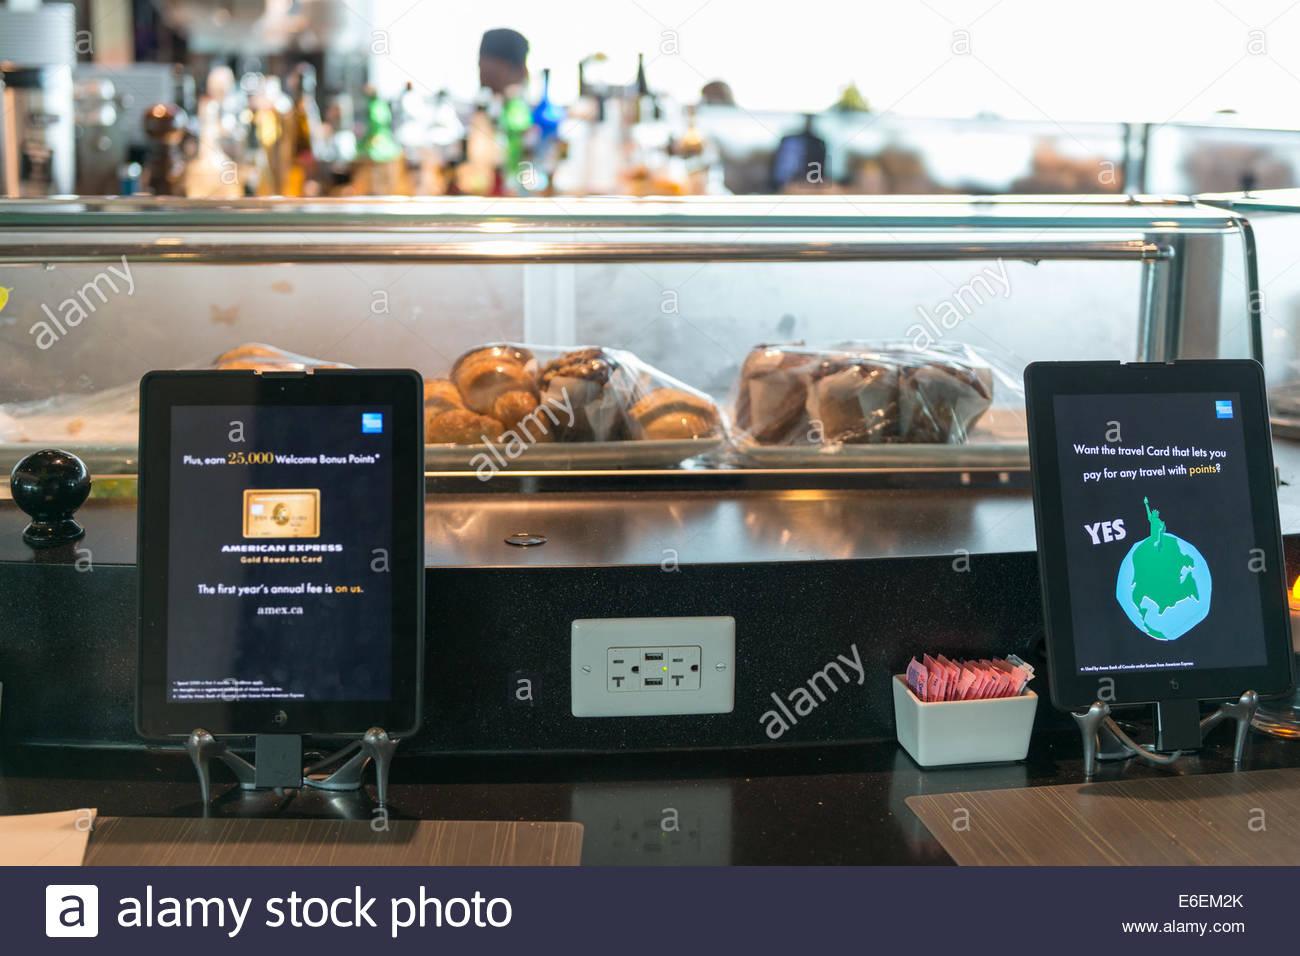 Restaurants using digital technology for self serving regarding the customer self service - Stock Image